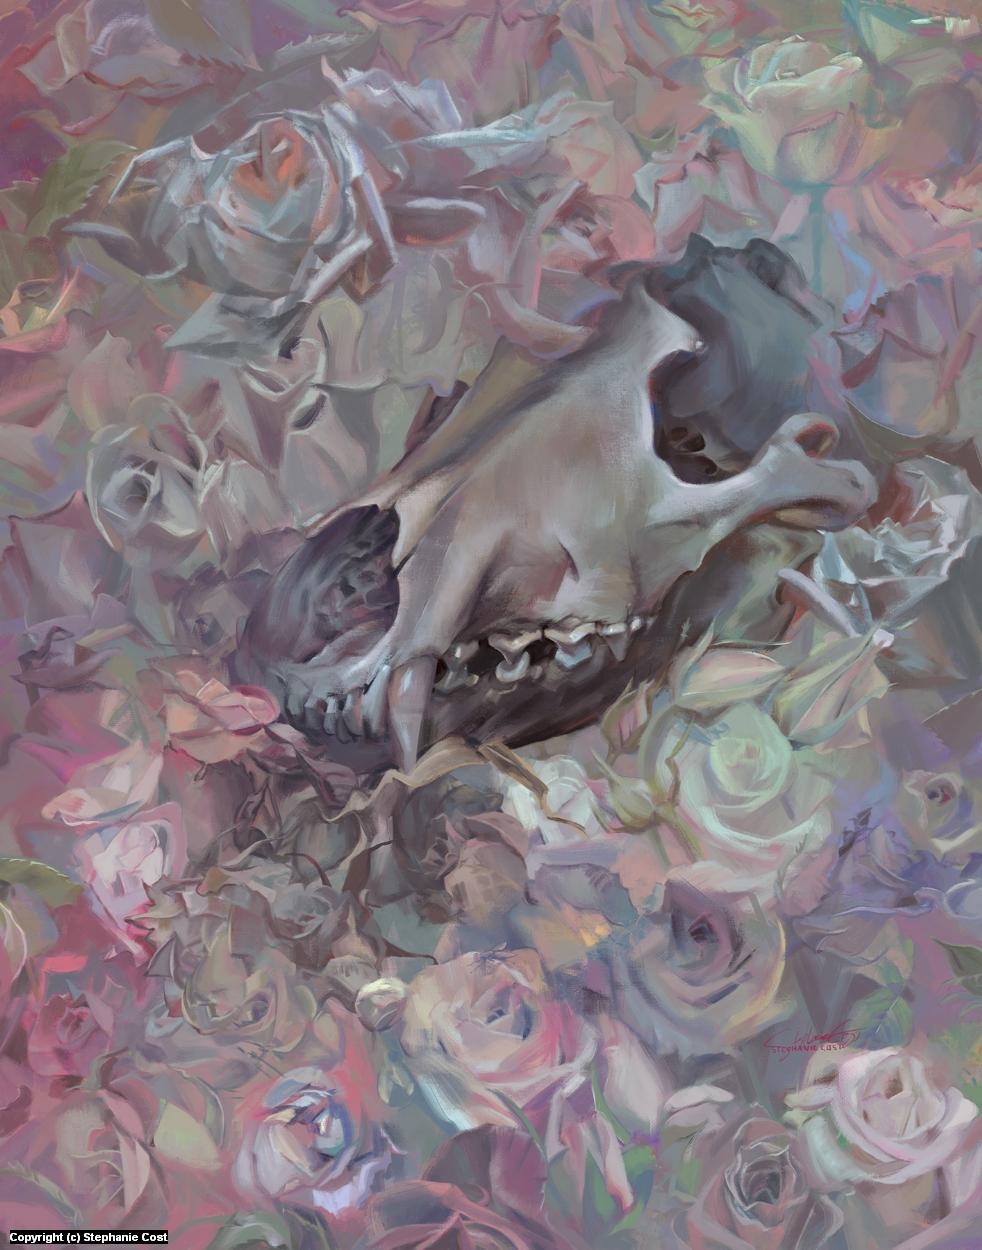 Lead White Artwork by Stephanie Cost